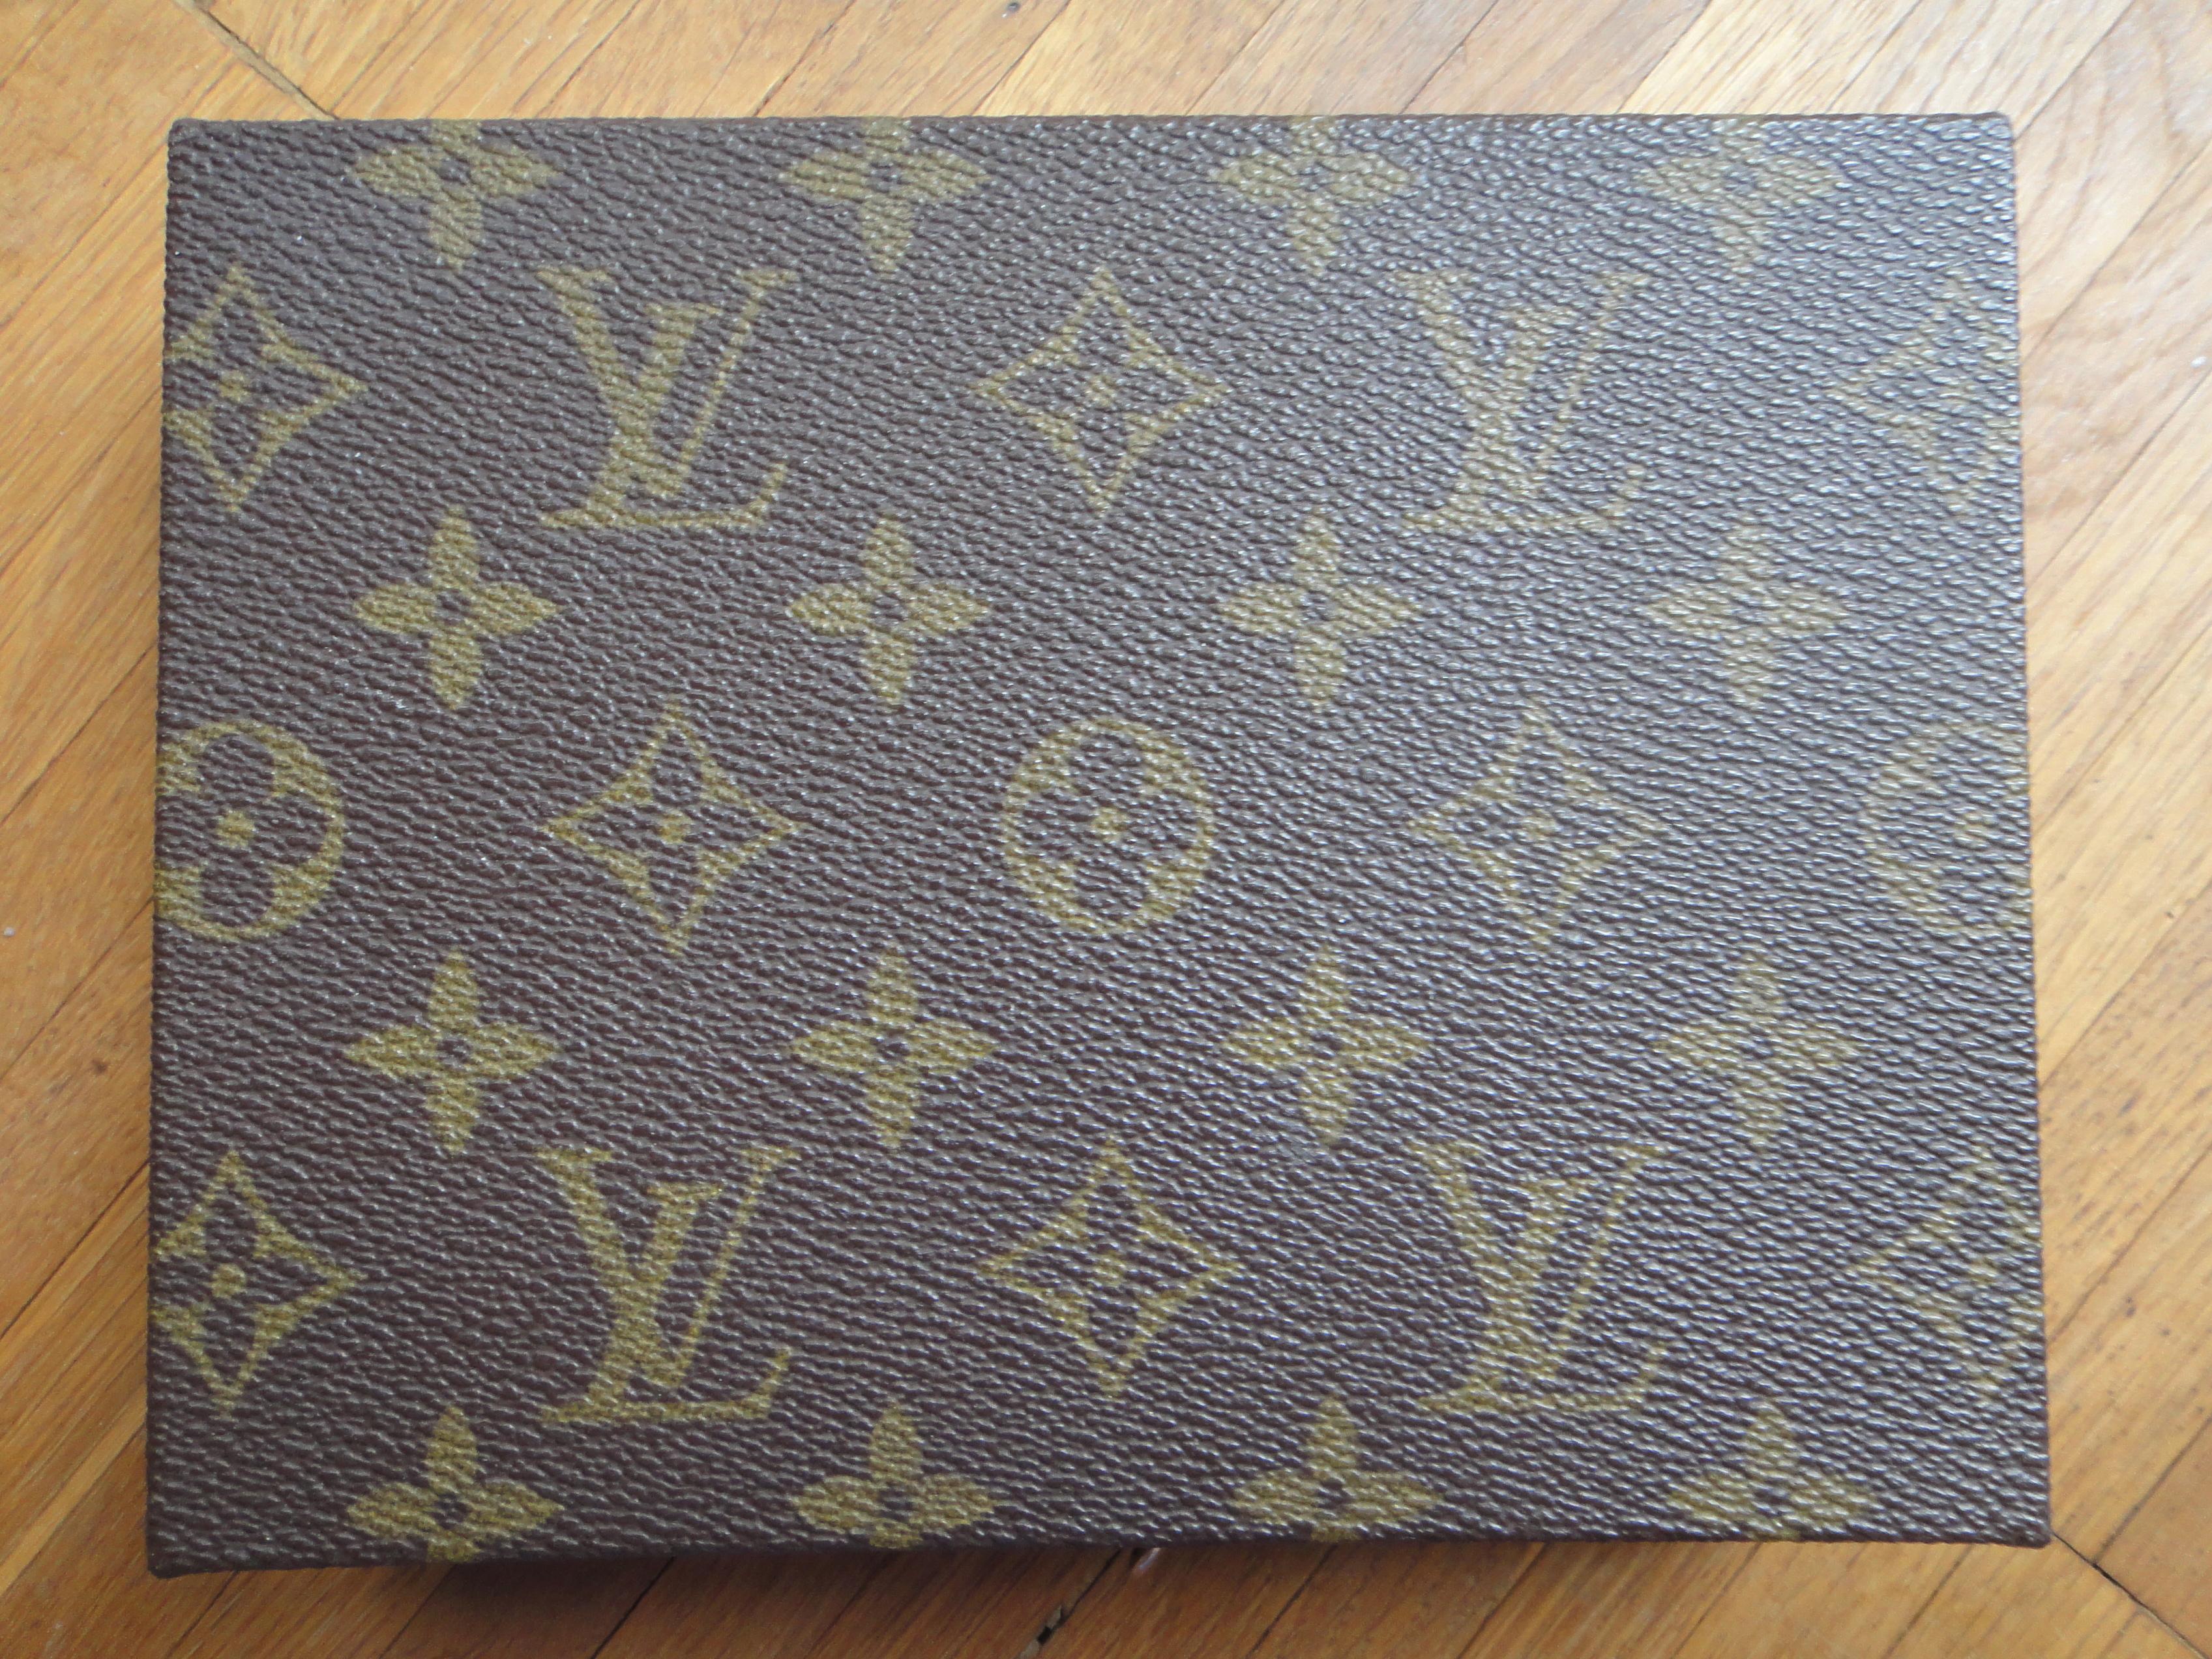 Louis Vuitton Boite Bijoux 17